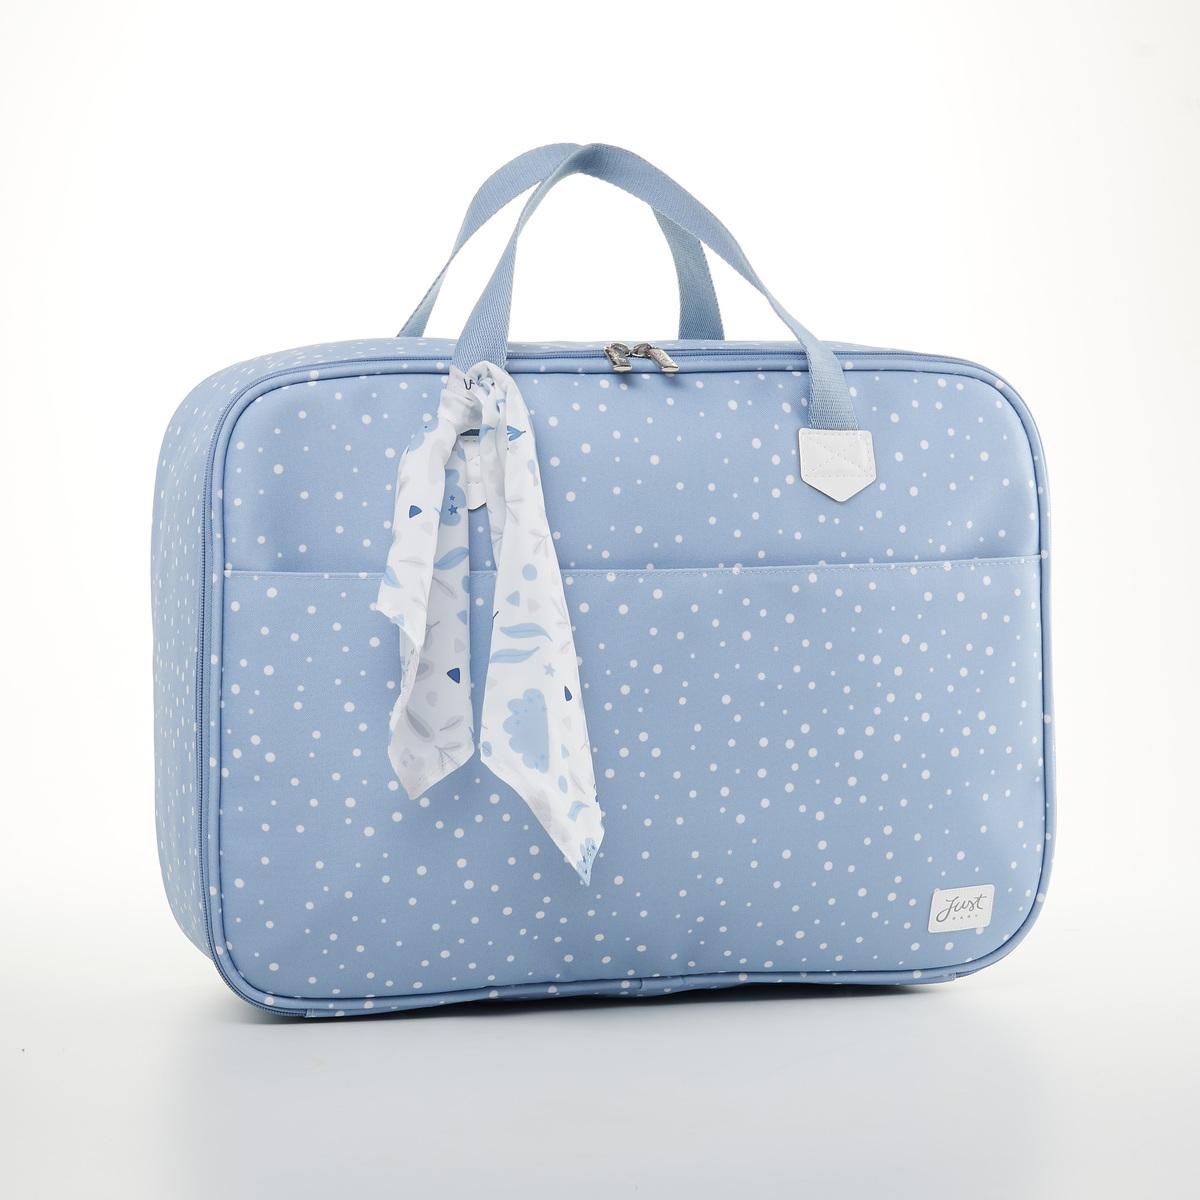 Kit Mala Maternidade + Bolsa Bebê + Frasqueira Térmica Bunny Azul - Just Baby